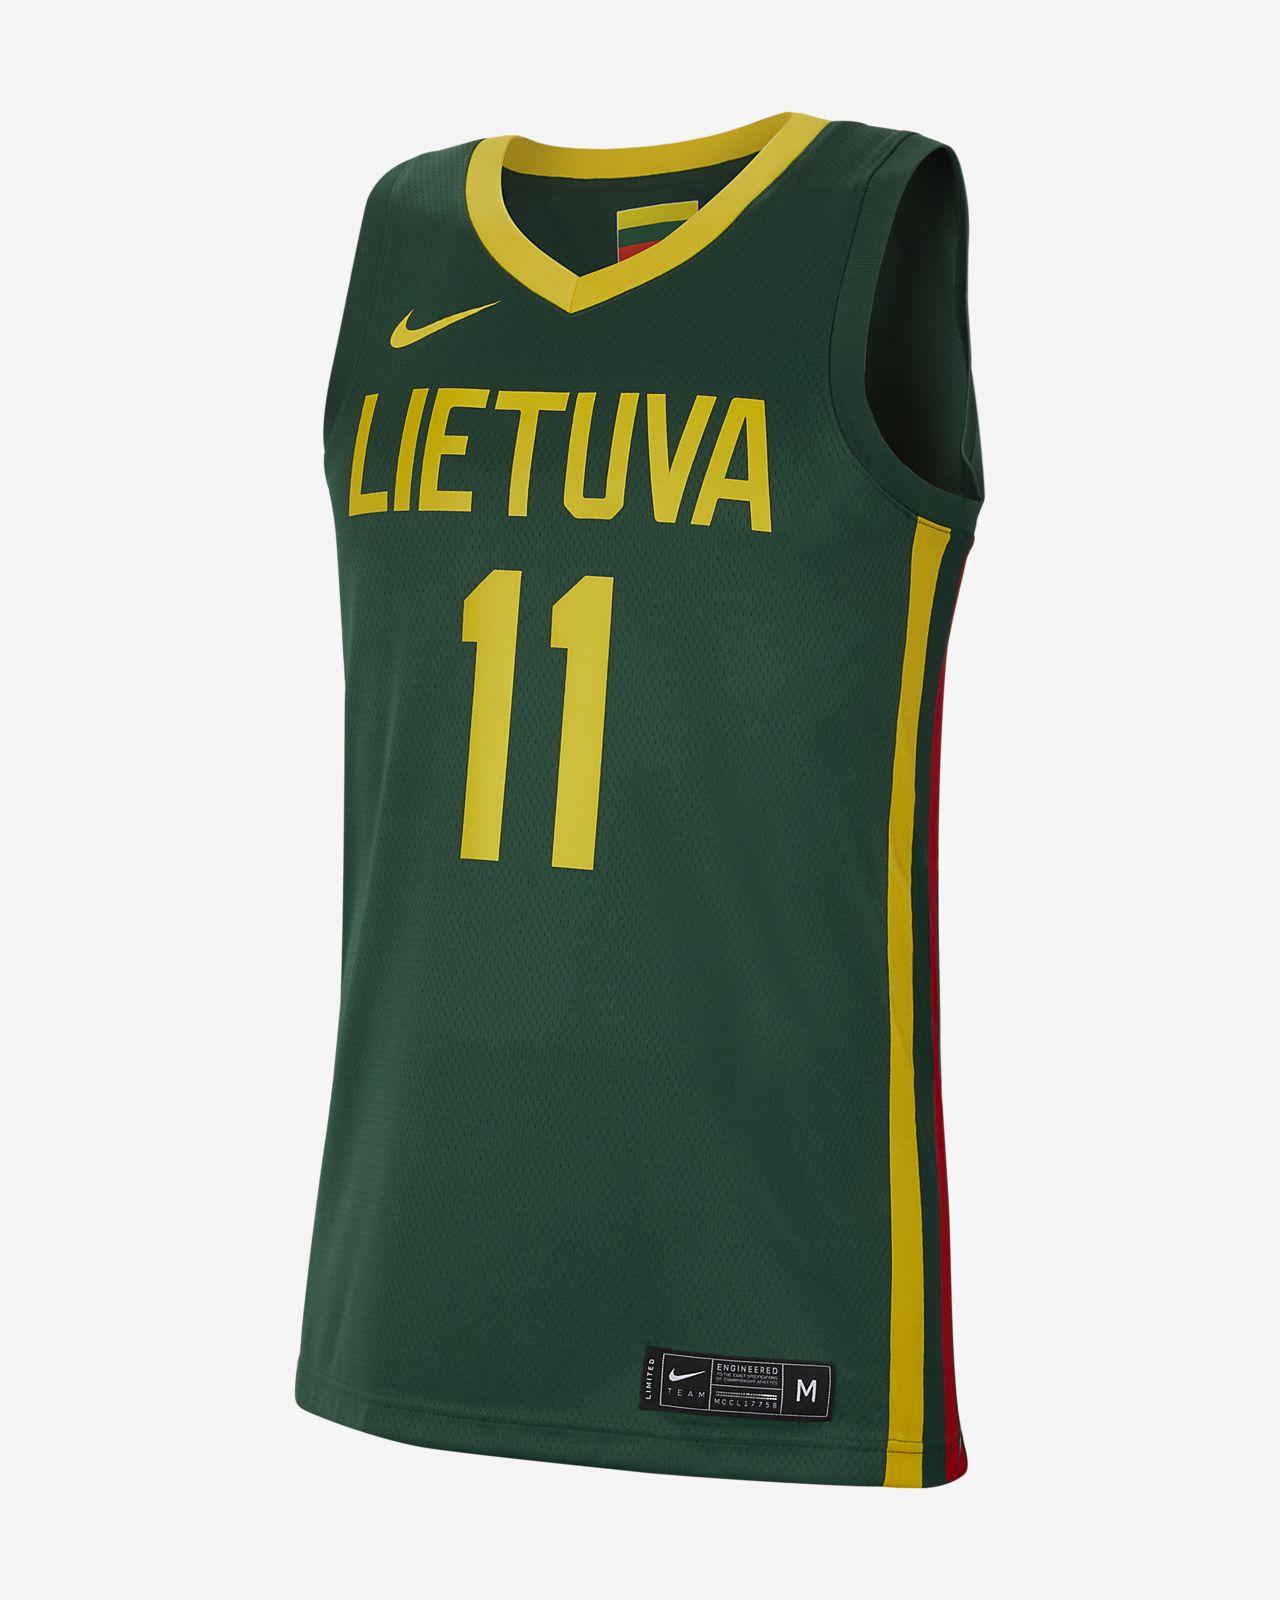 Camiseta de básquetbol para hombre Lithuania Nike (Road)